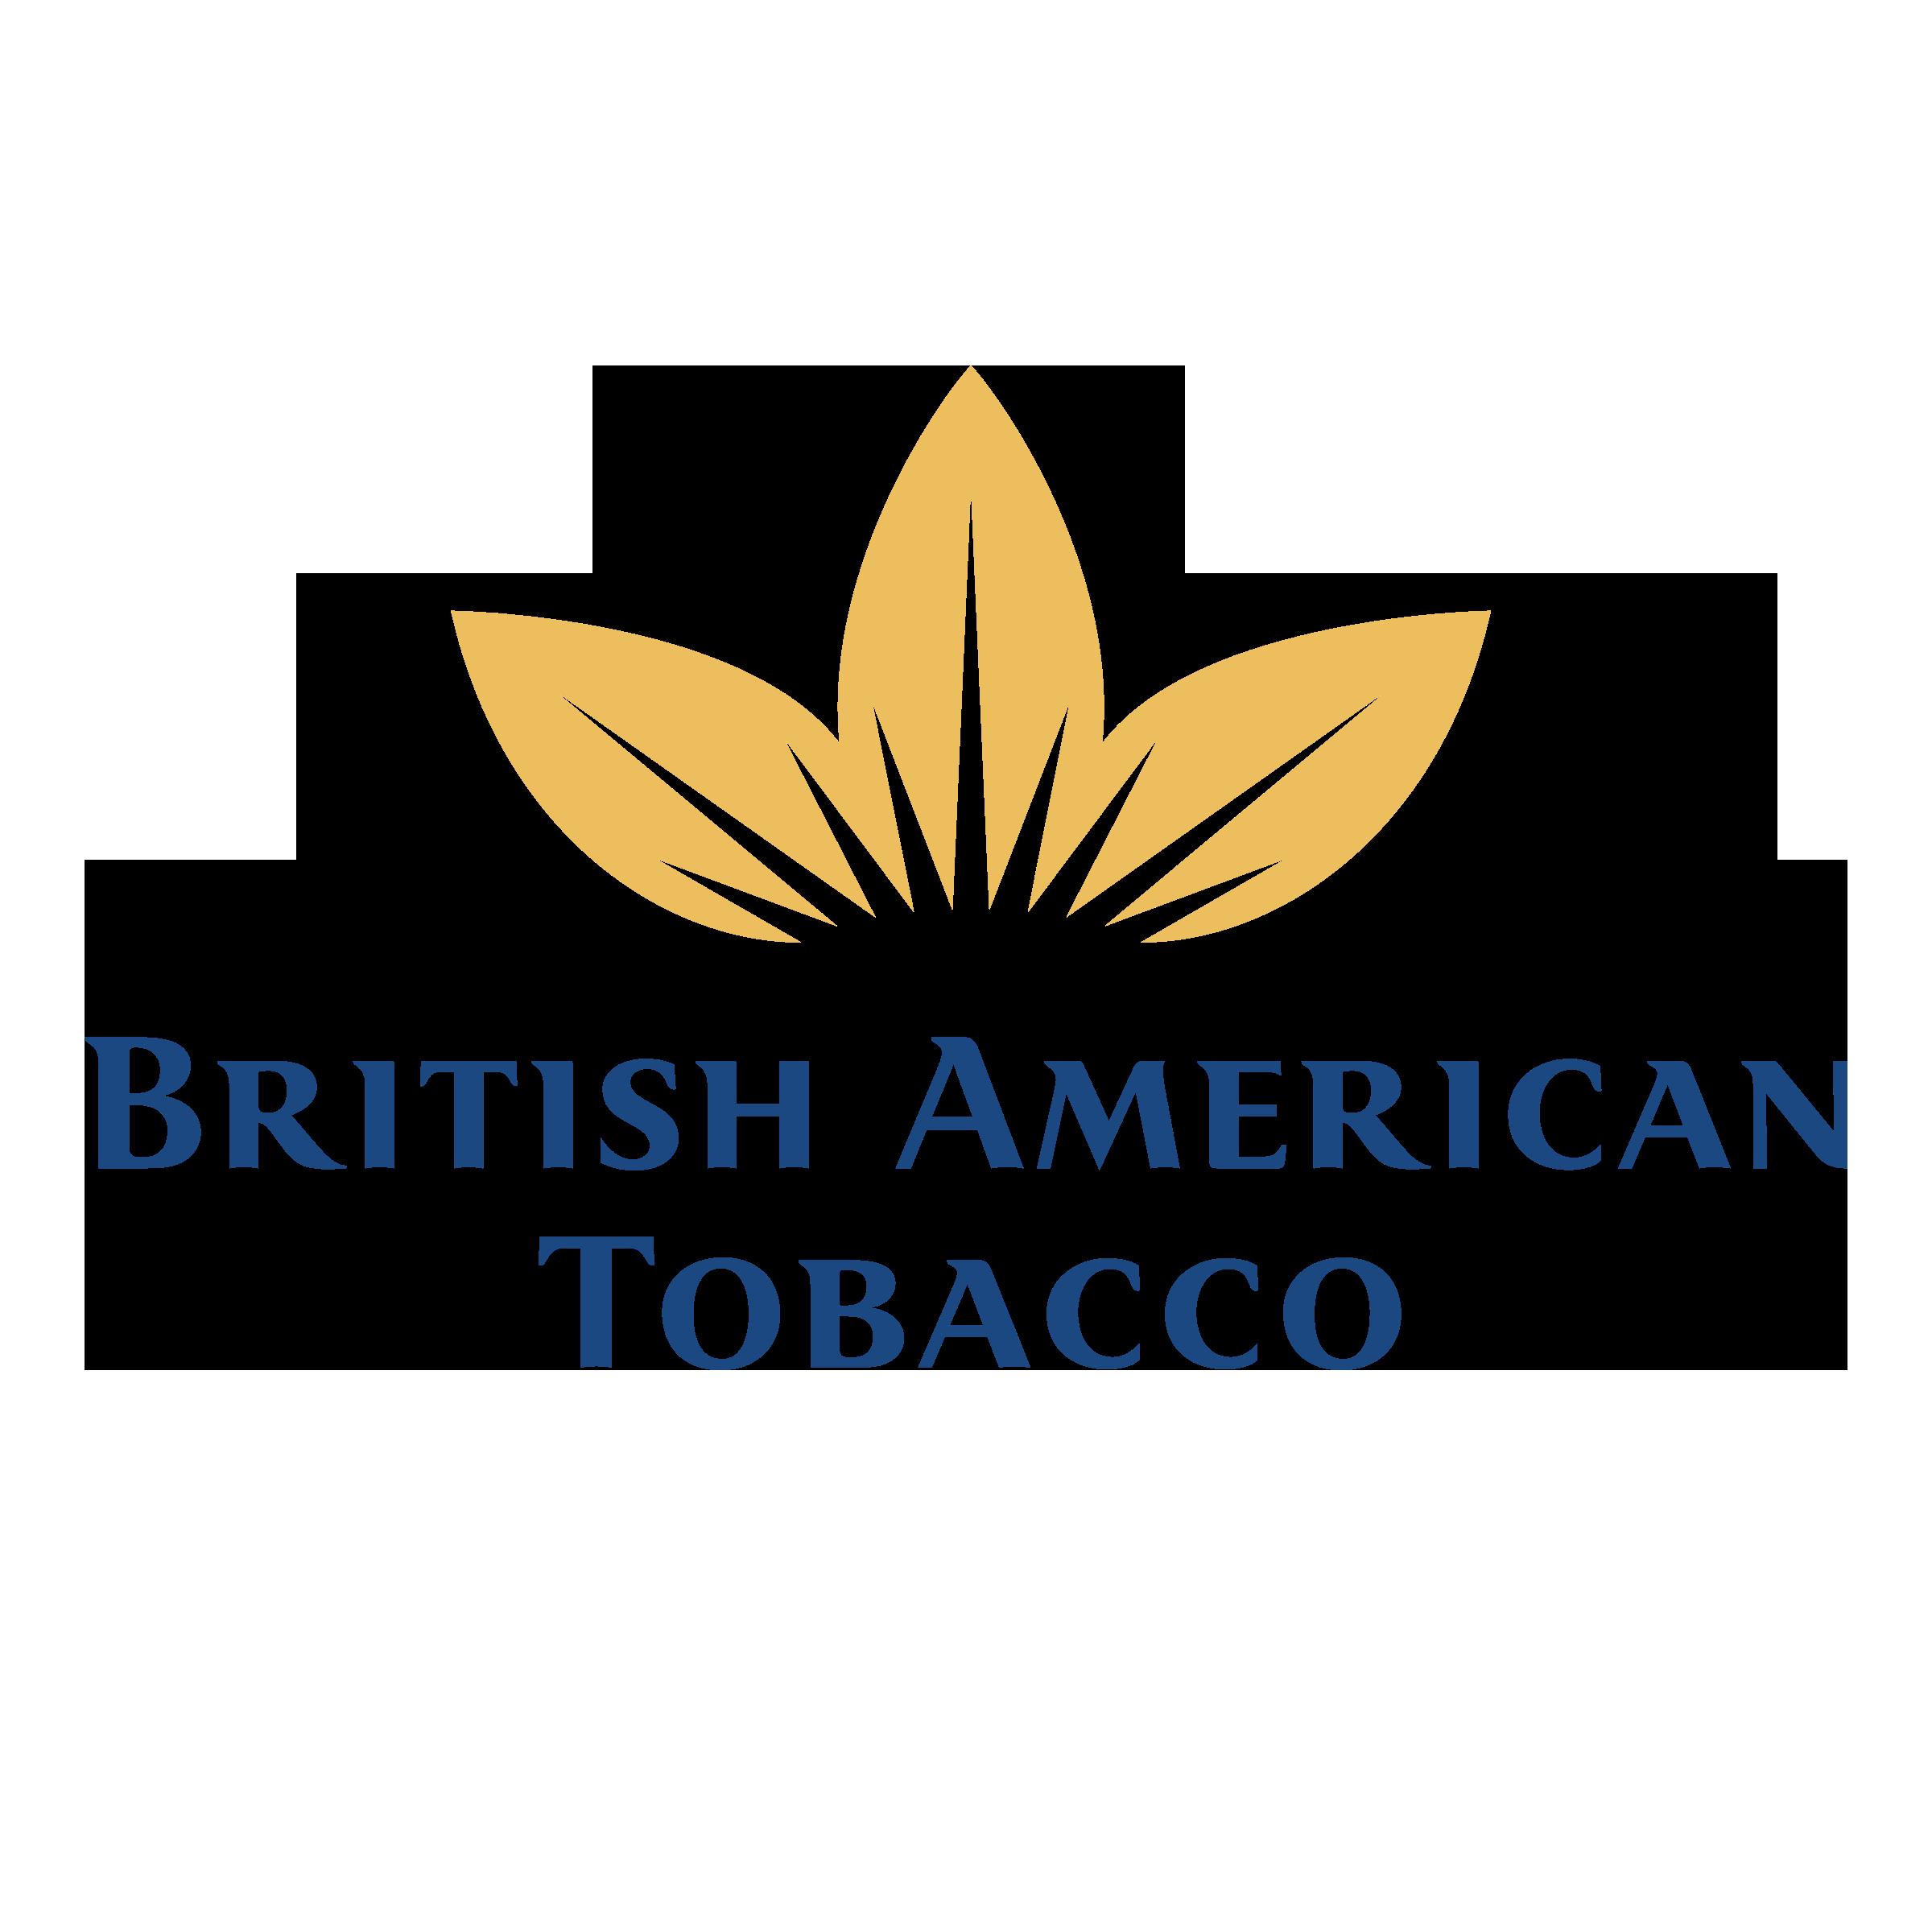 british-american-tobacco-the-netherlands-logo-png-transparent